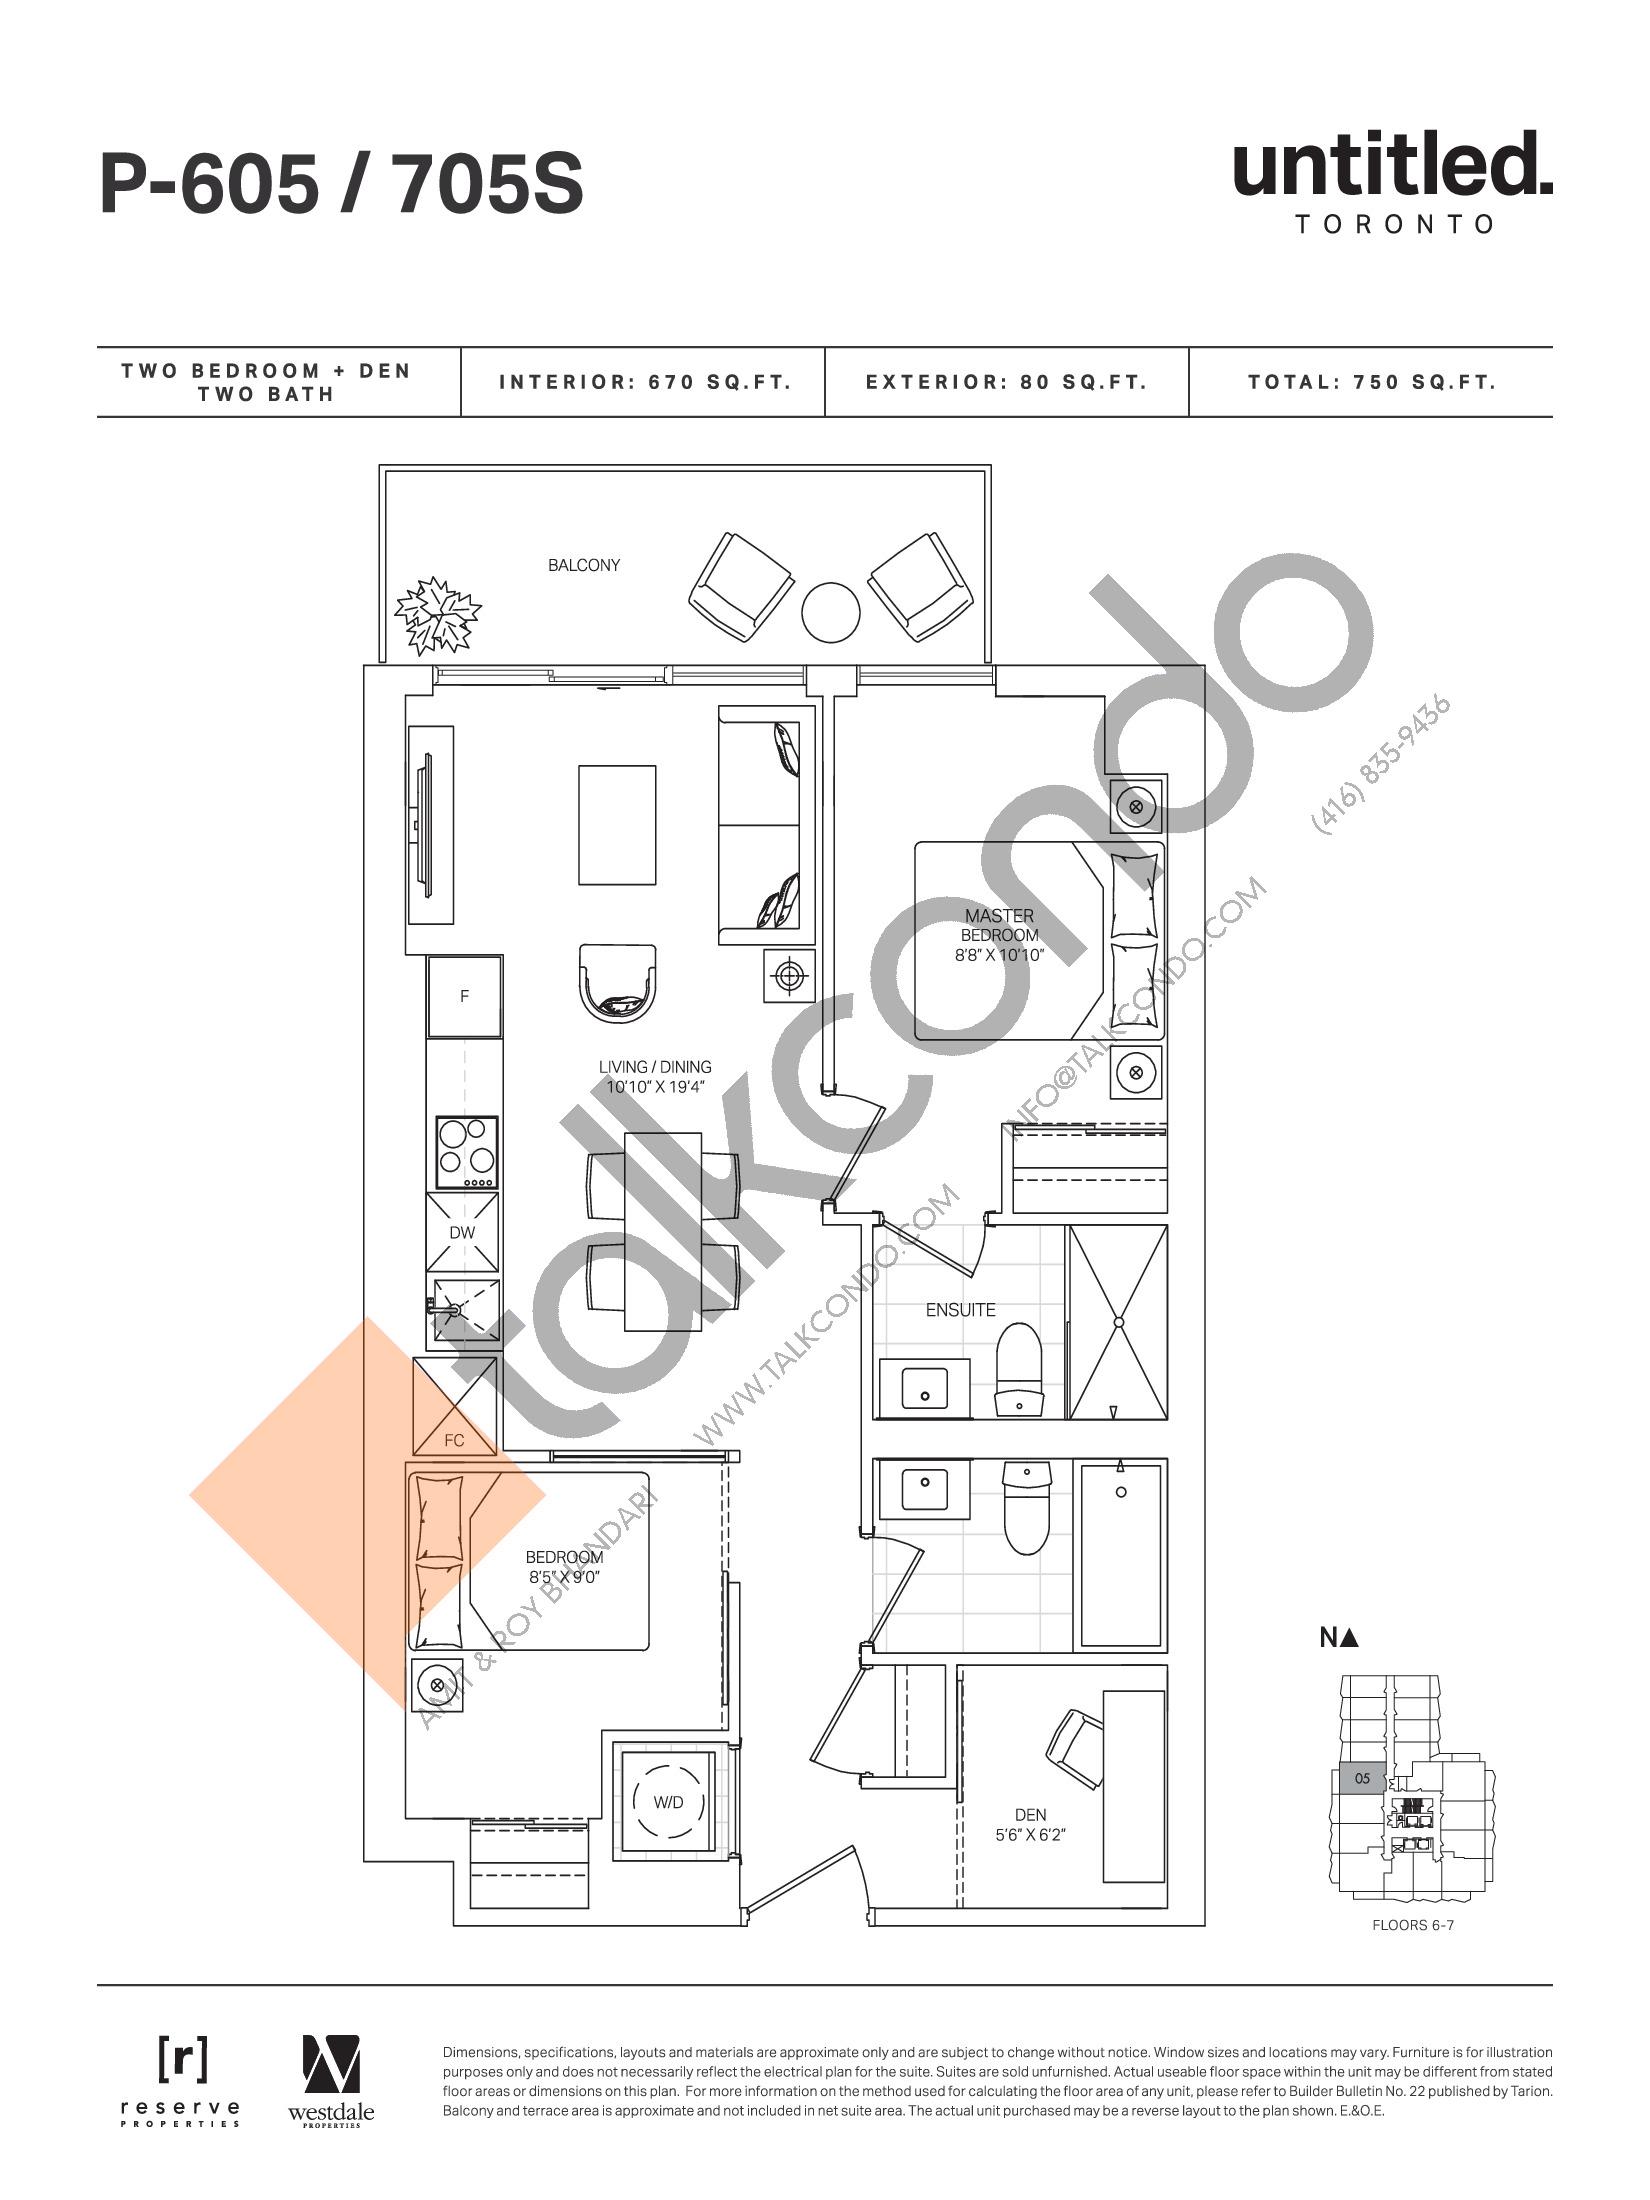 P-605 / 705S Floor Plan at Untitled Toronto Condos - 670 sq.ft